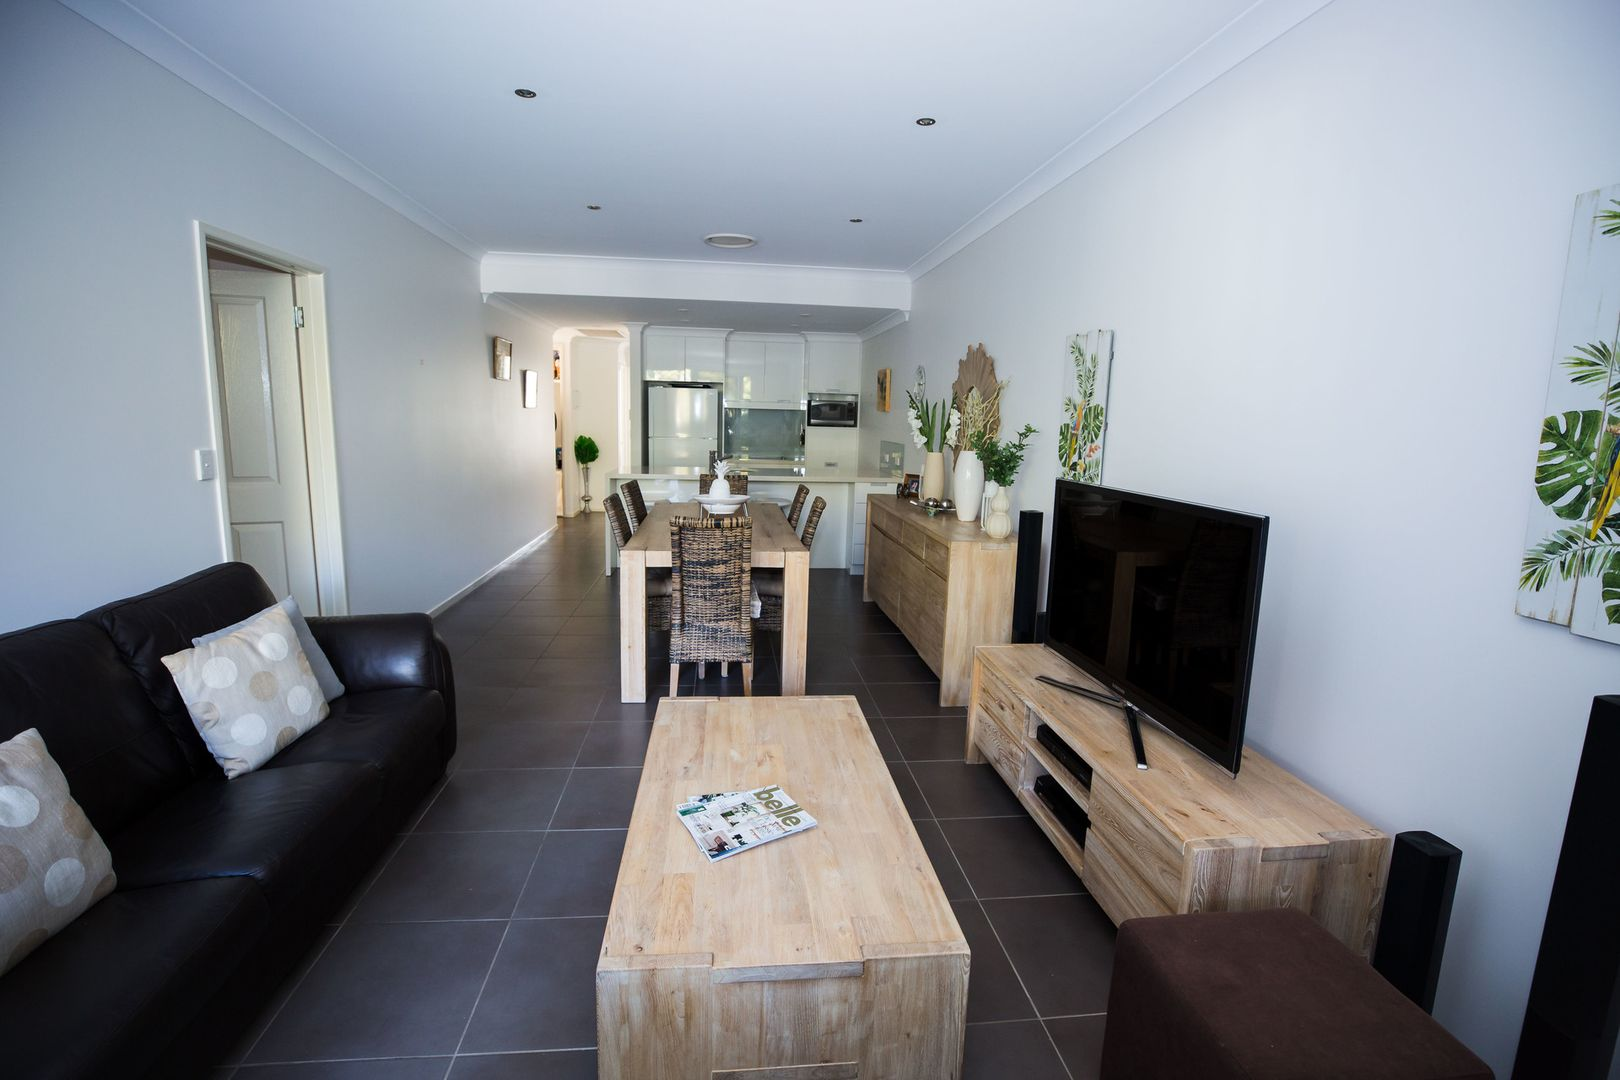 2/76 Pratten Street, Dalby QLD 4405, Image 1